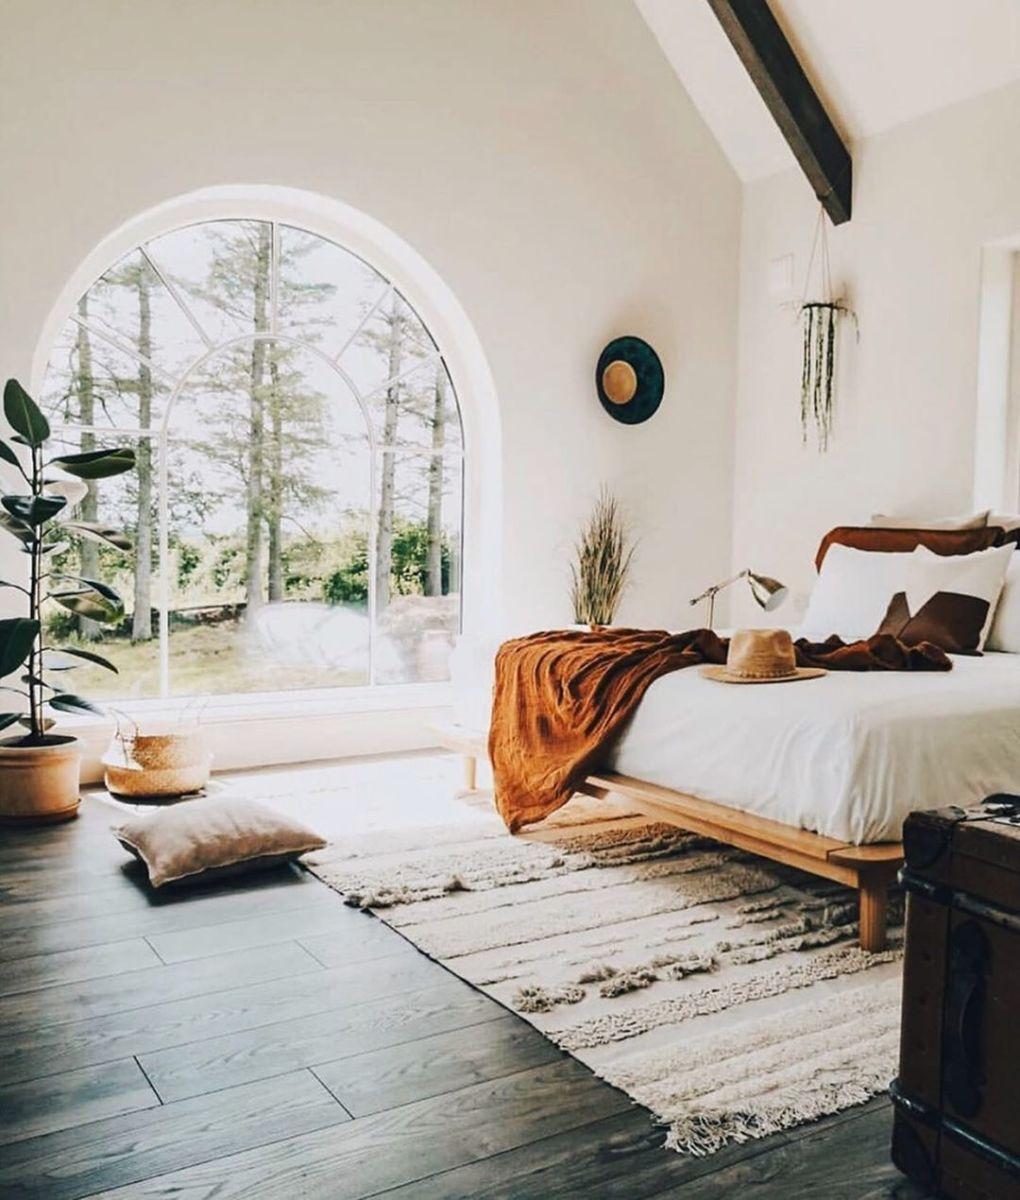 Minimal Interior Design Inspiration 203 Home House Design Home Decor Inspiration